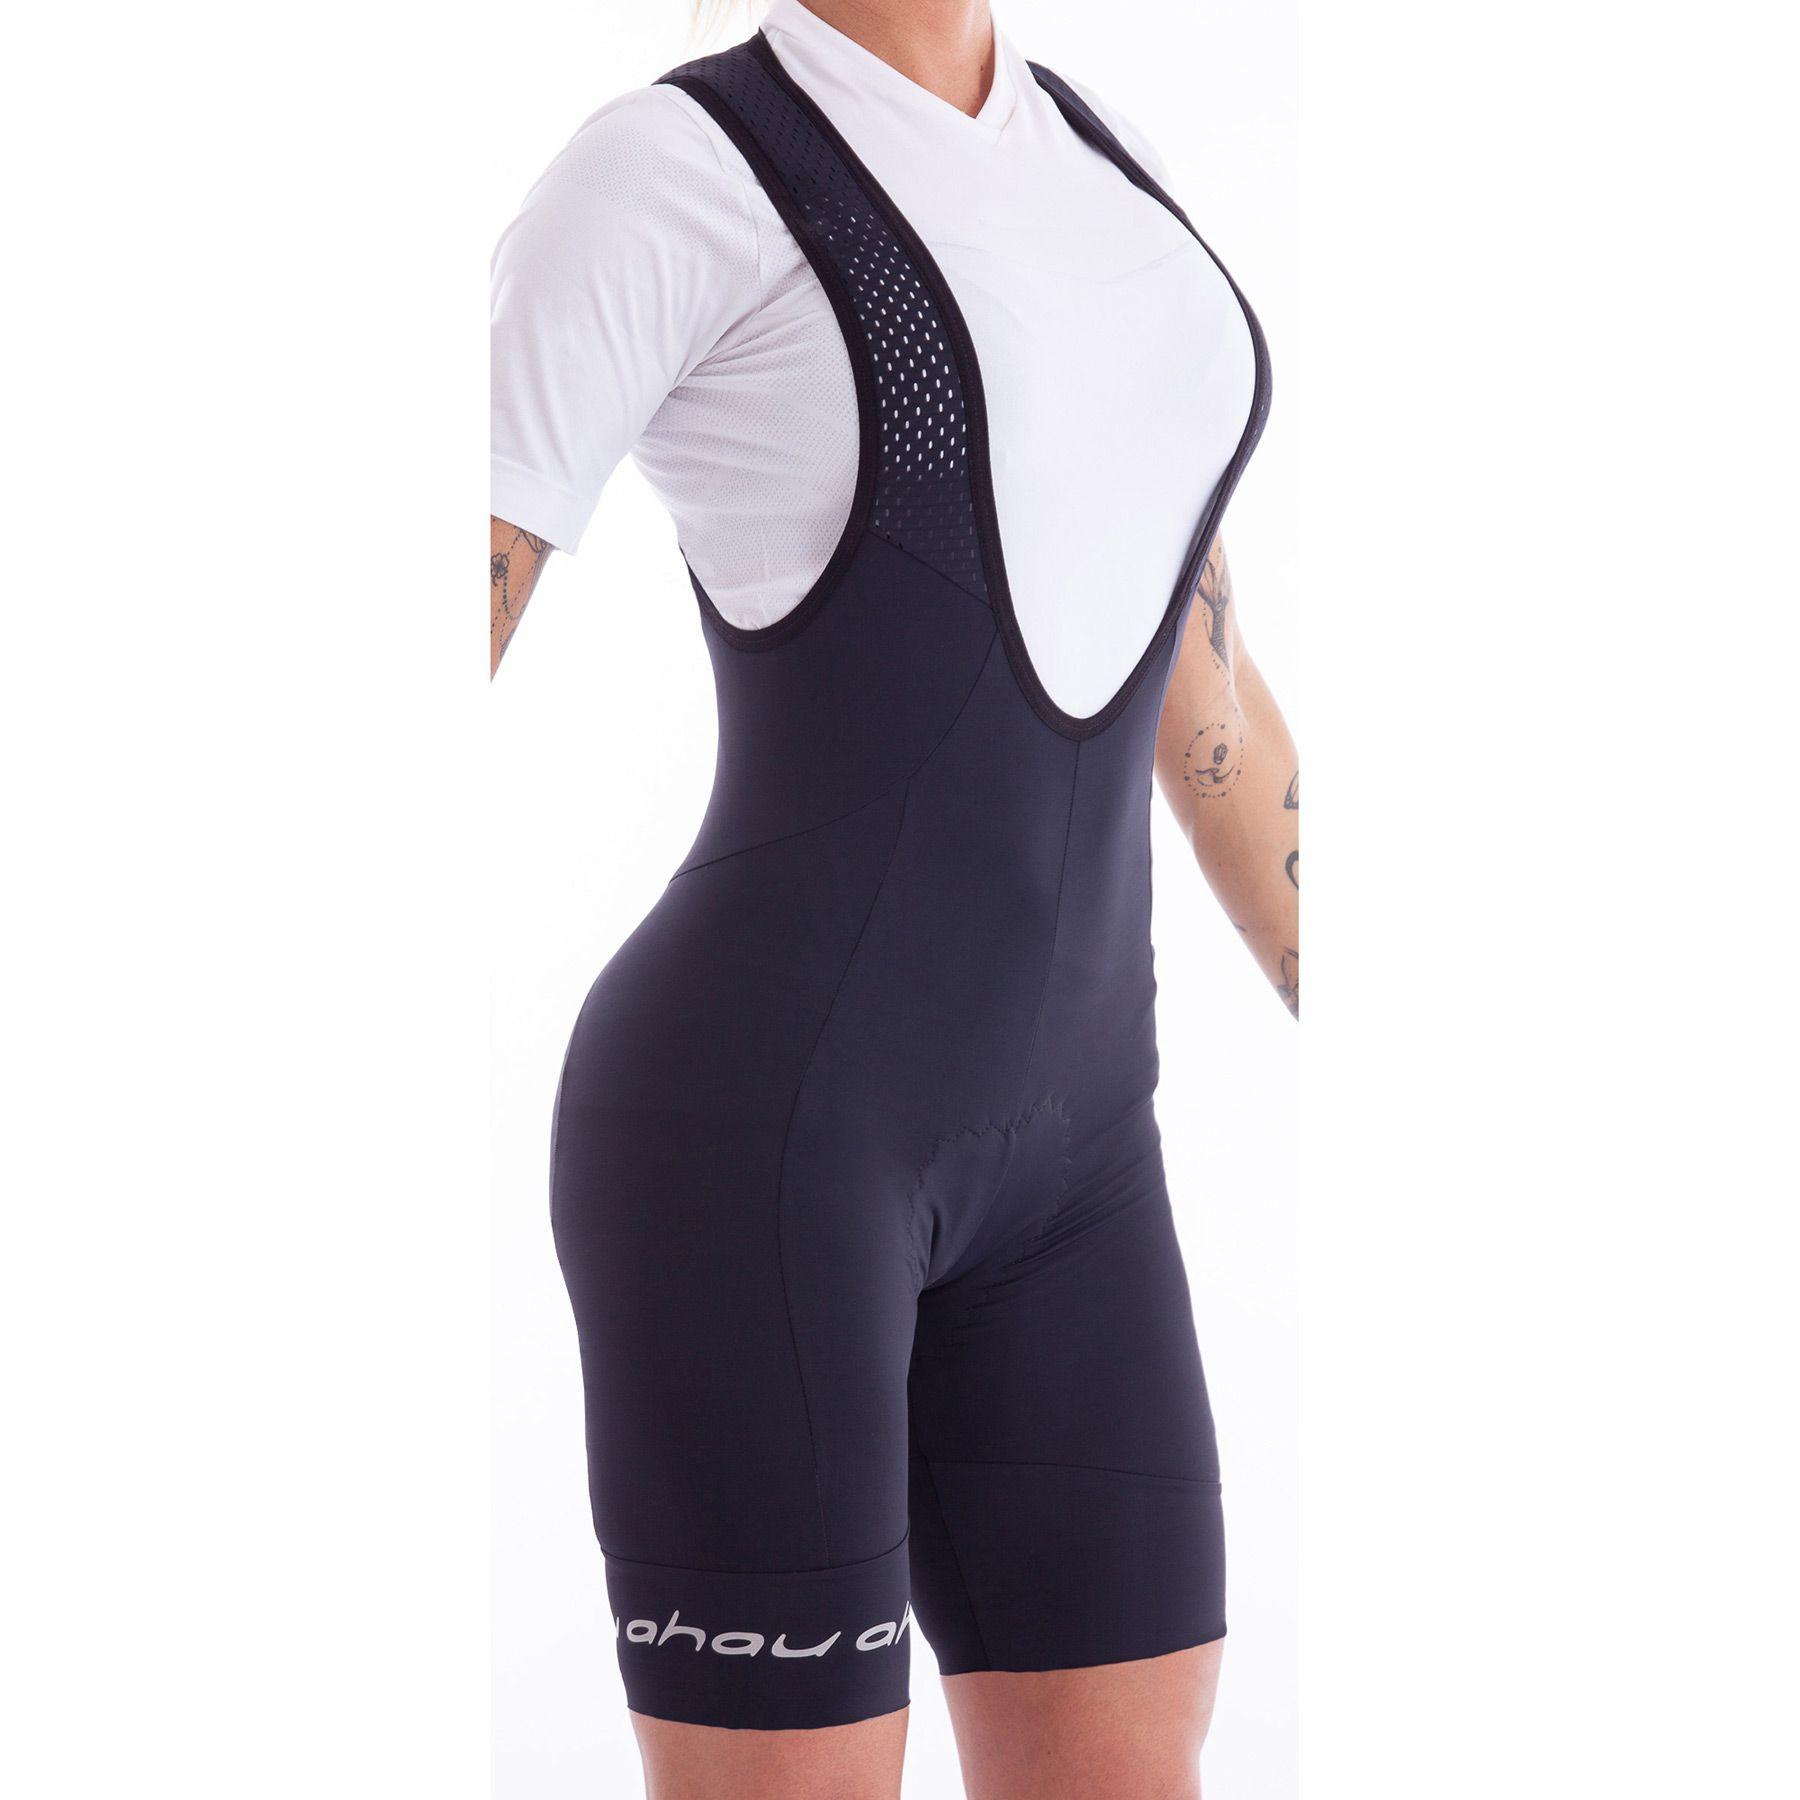 Bretelle Ciclismo Black Tie